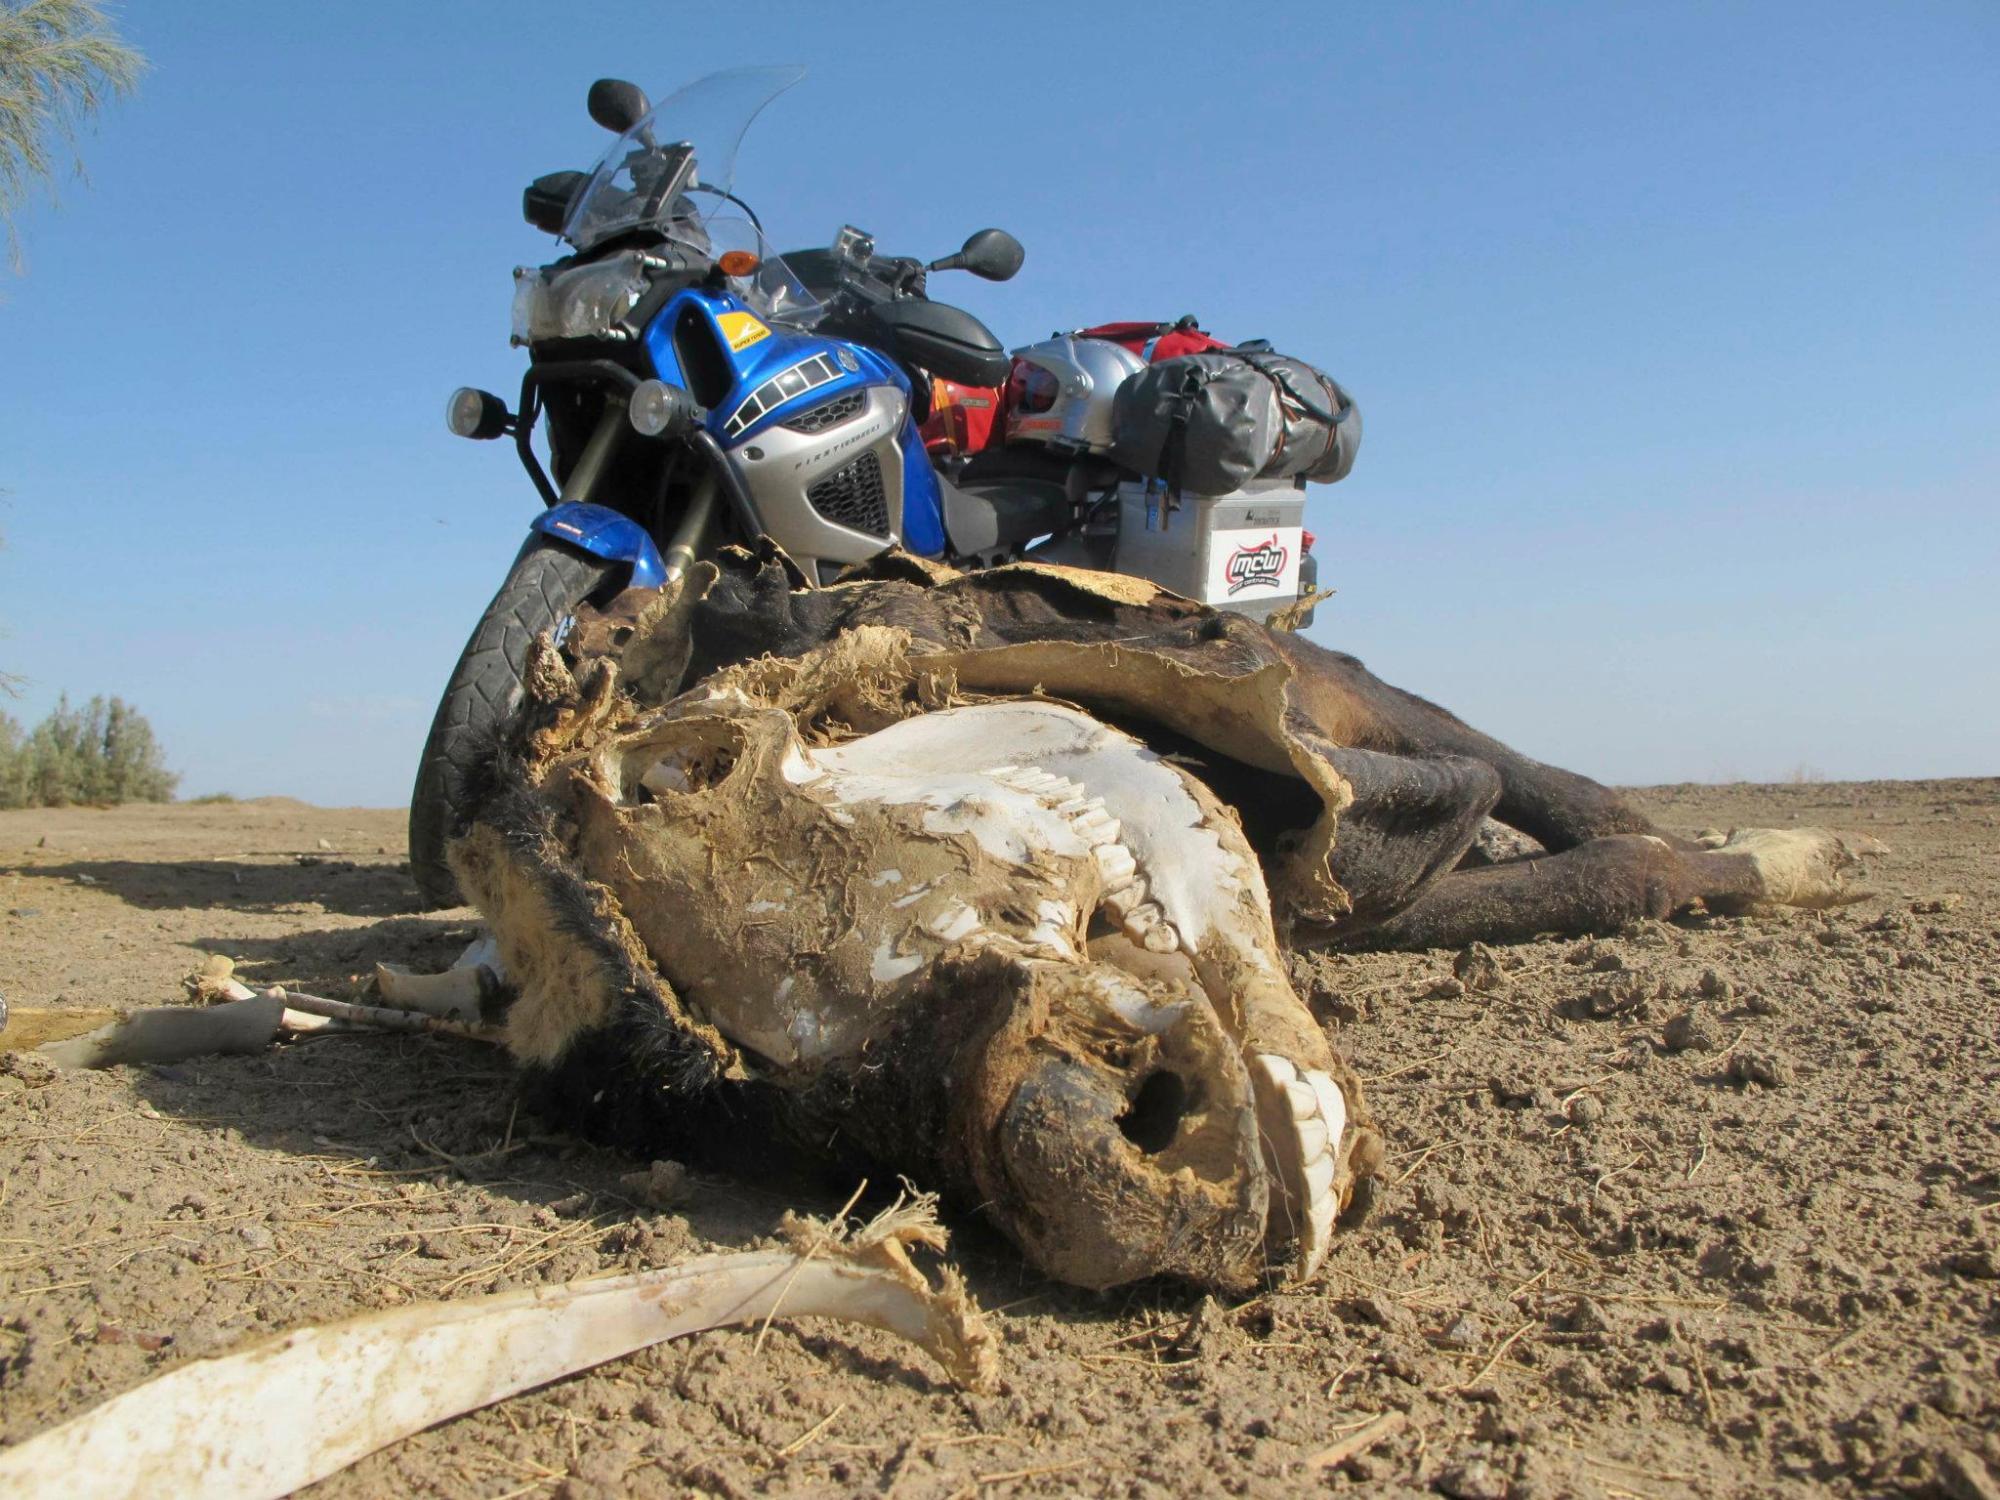 Ride across europe and asia, on yamaha Tenere